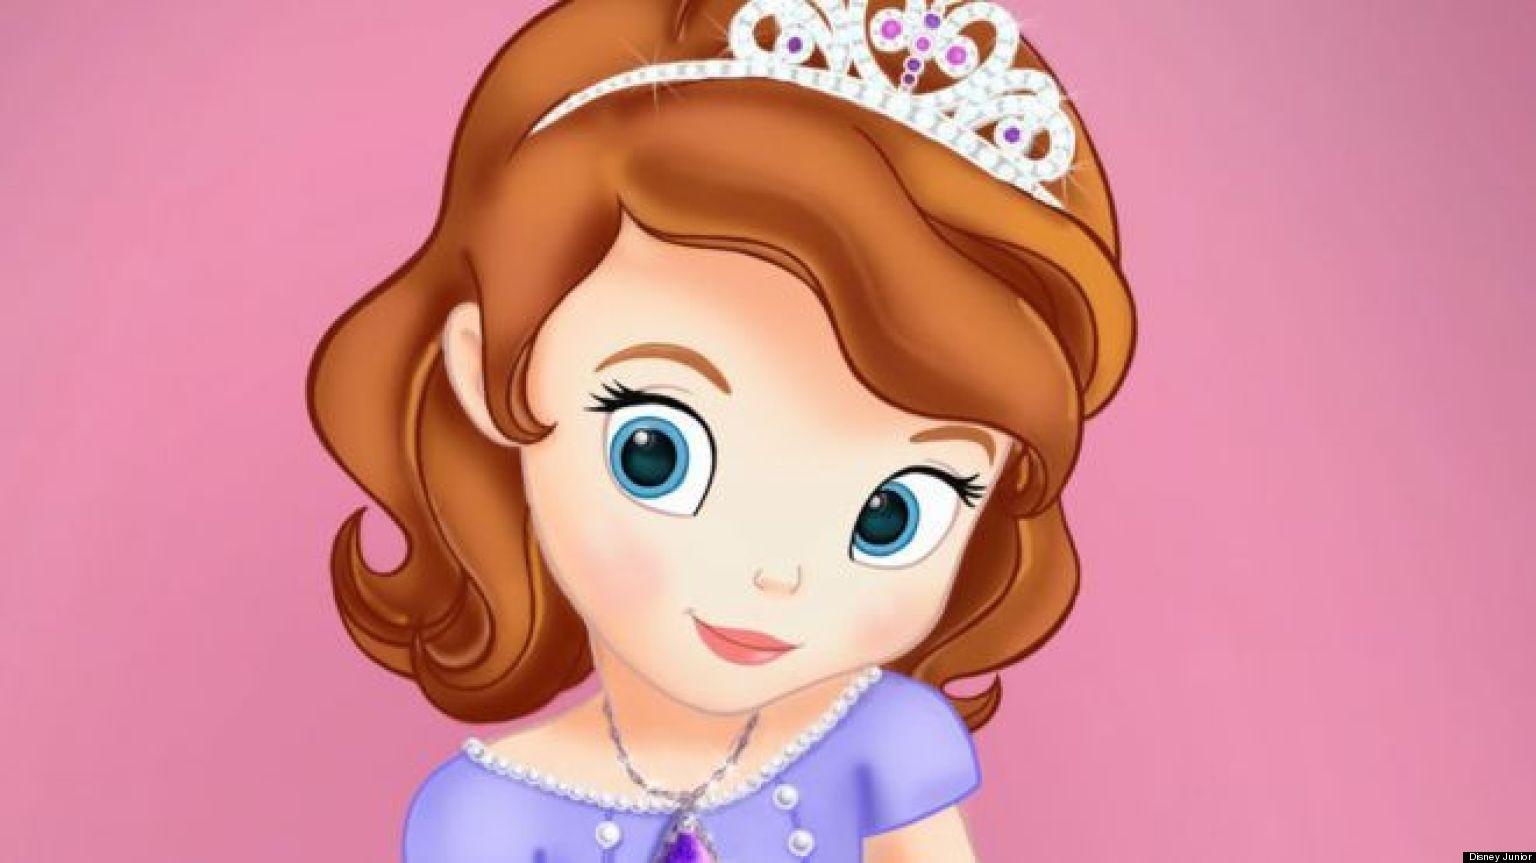 U0026 39 Sofia The First U0026 39 Is Disney U0026 39 S First Latina Princess